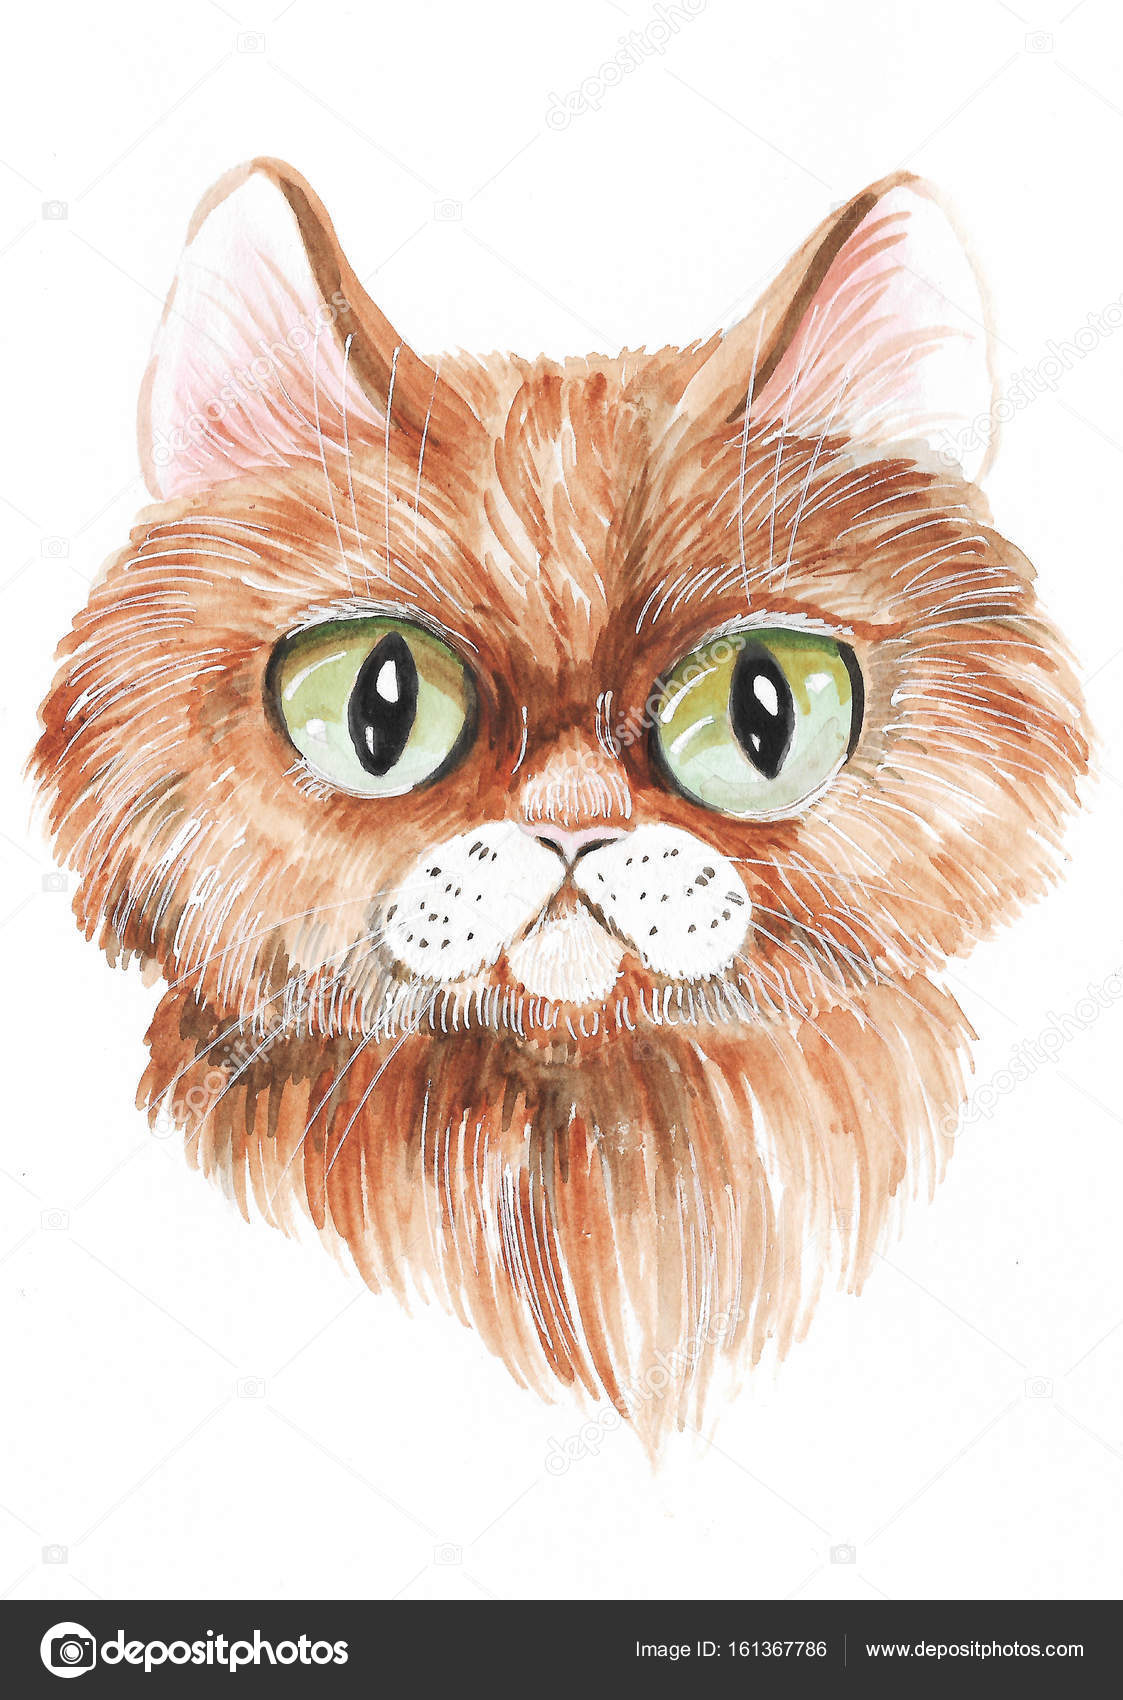 Süße Katze in Aquarell gemalt — Stockfoto © YuliaRey #161367786